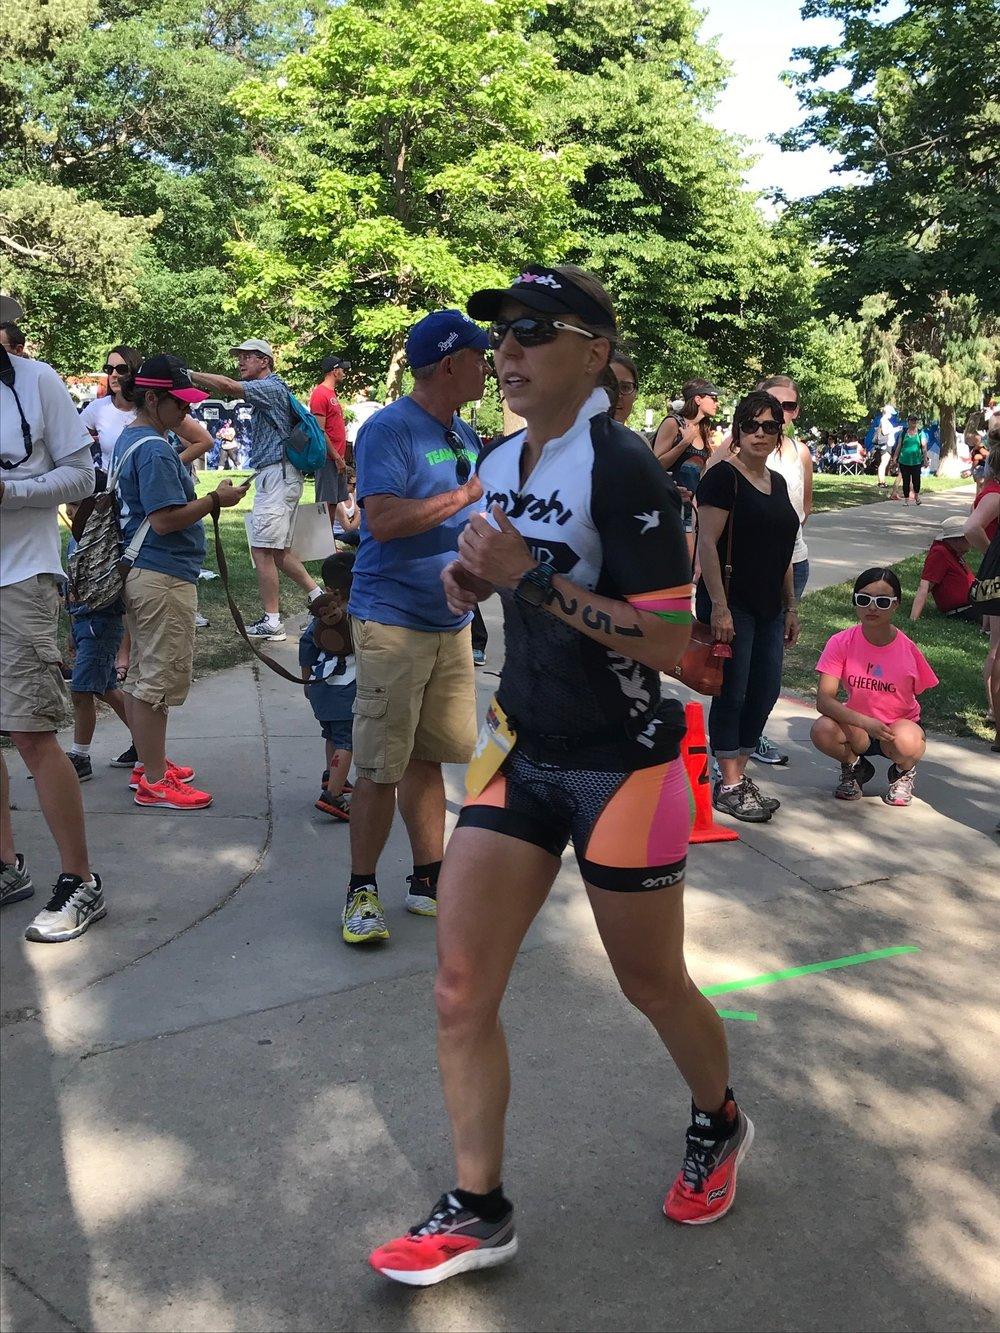 Amy in laser-like pursuit of the finish line. Photo credit goes to Jen Rydelski Jardeleza.